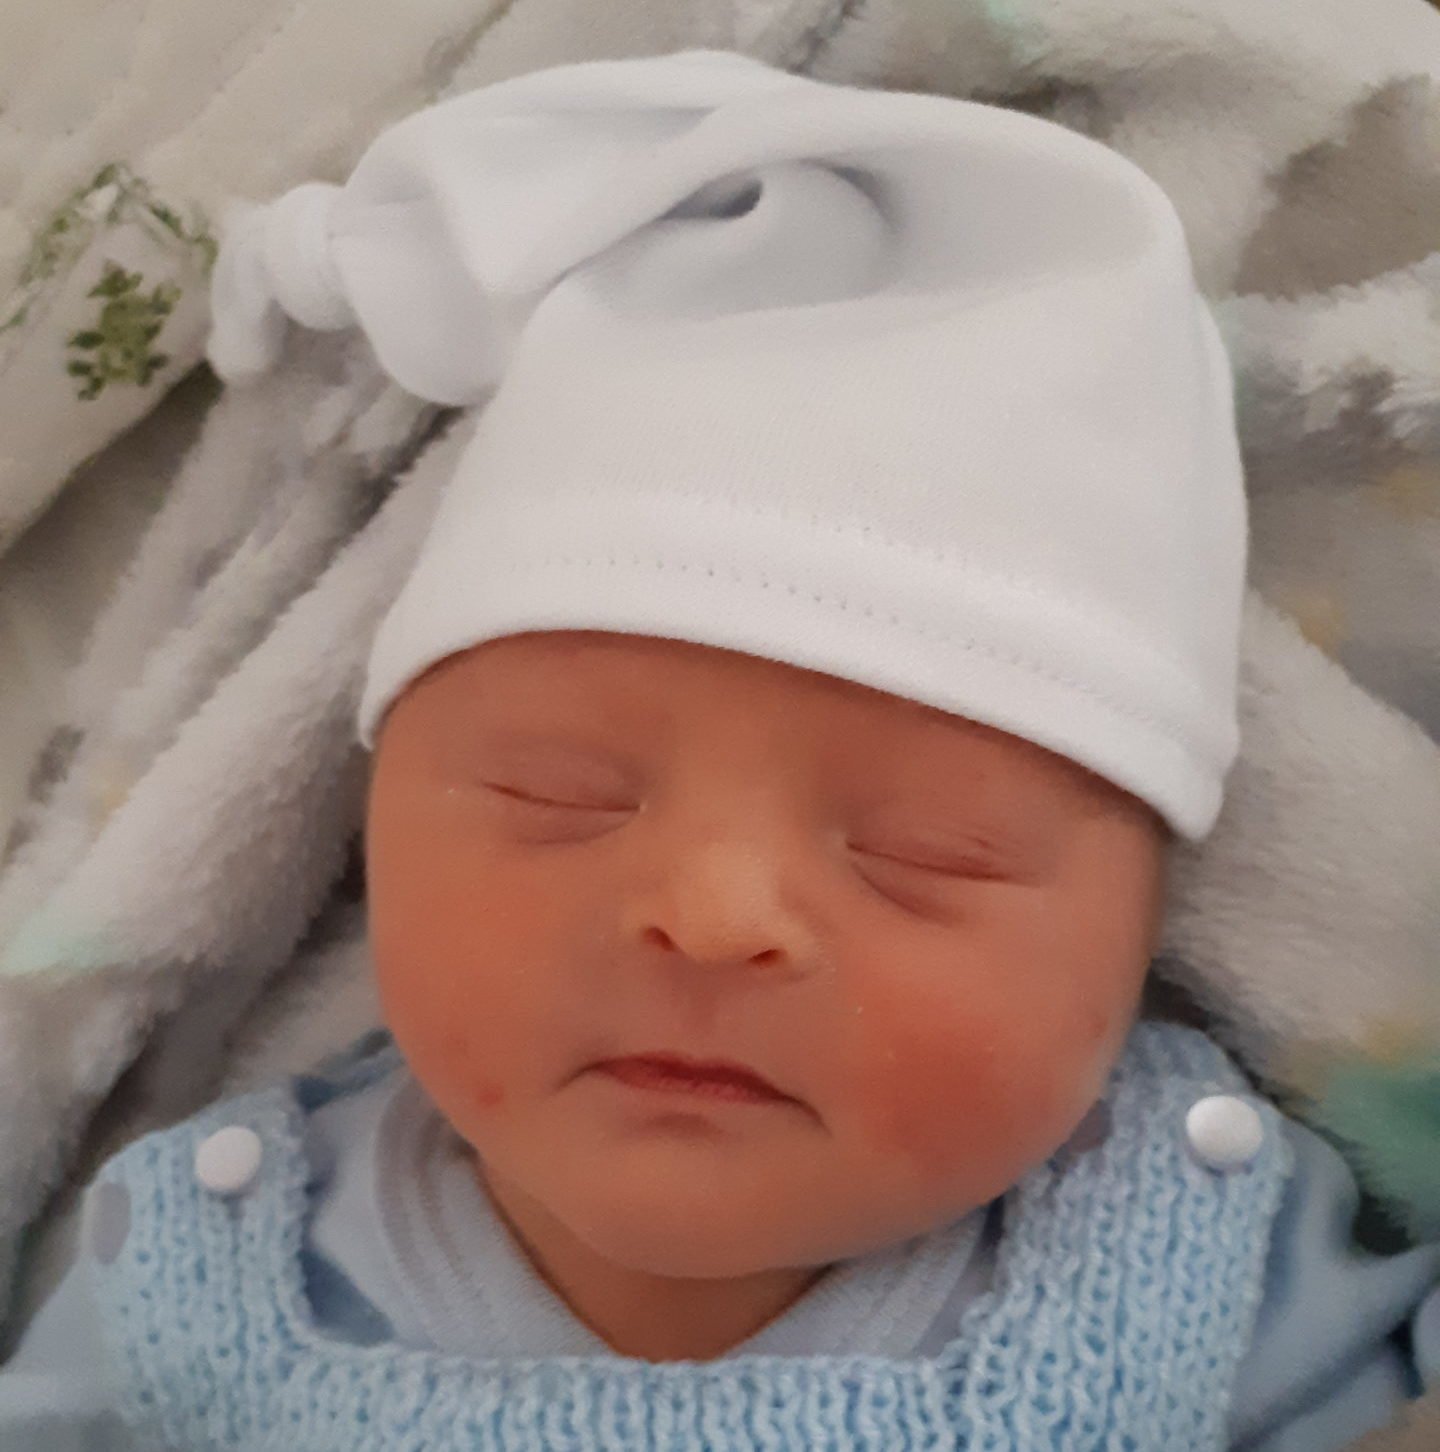 bebe recien nacido con síndrome de Down